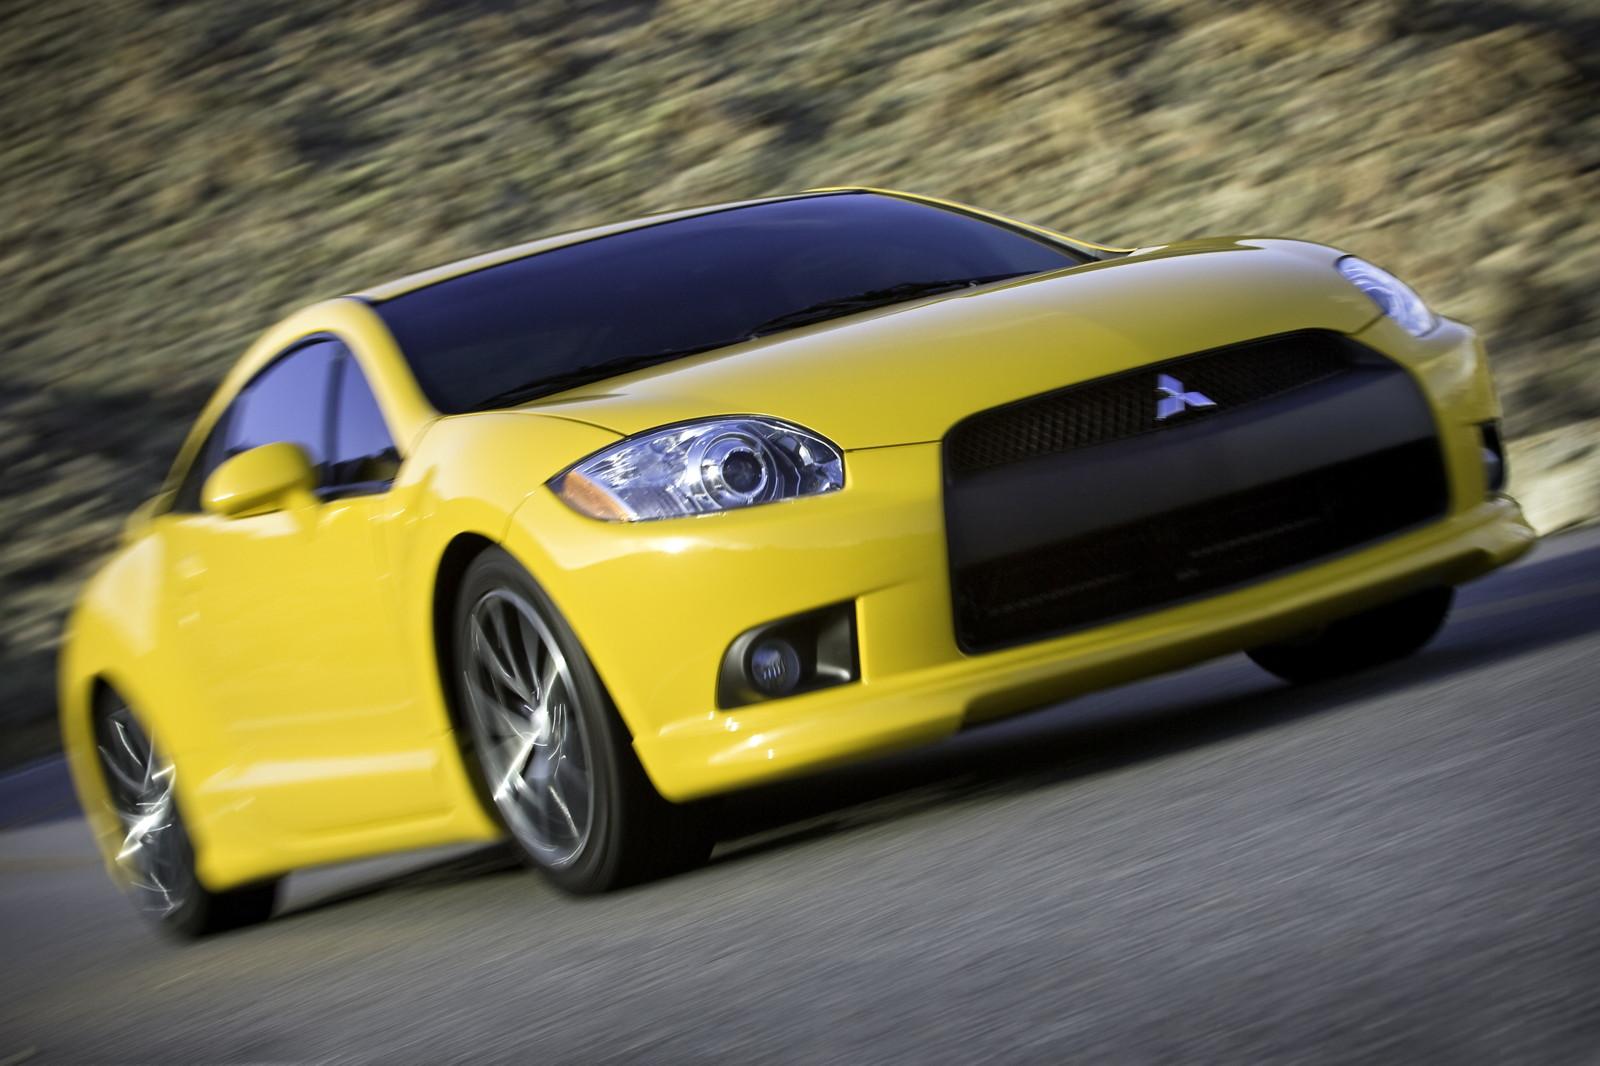 Affordable Sports Car: 2010 Mitsubishi Eclipse